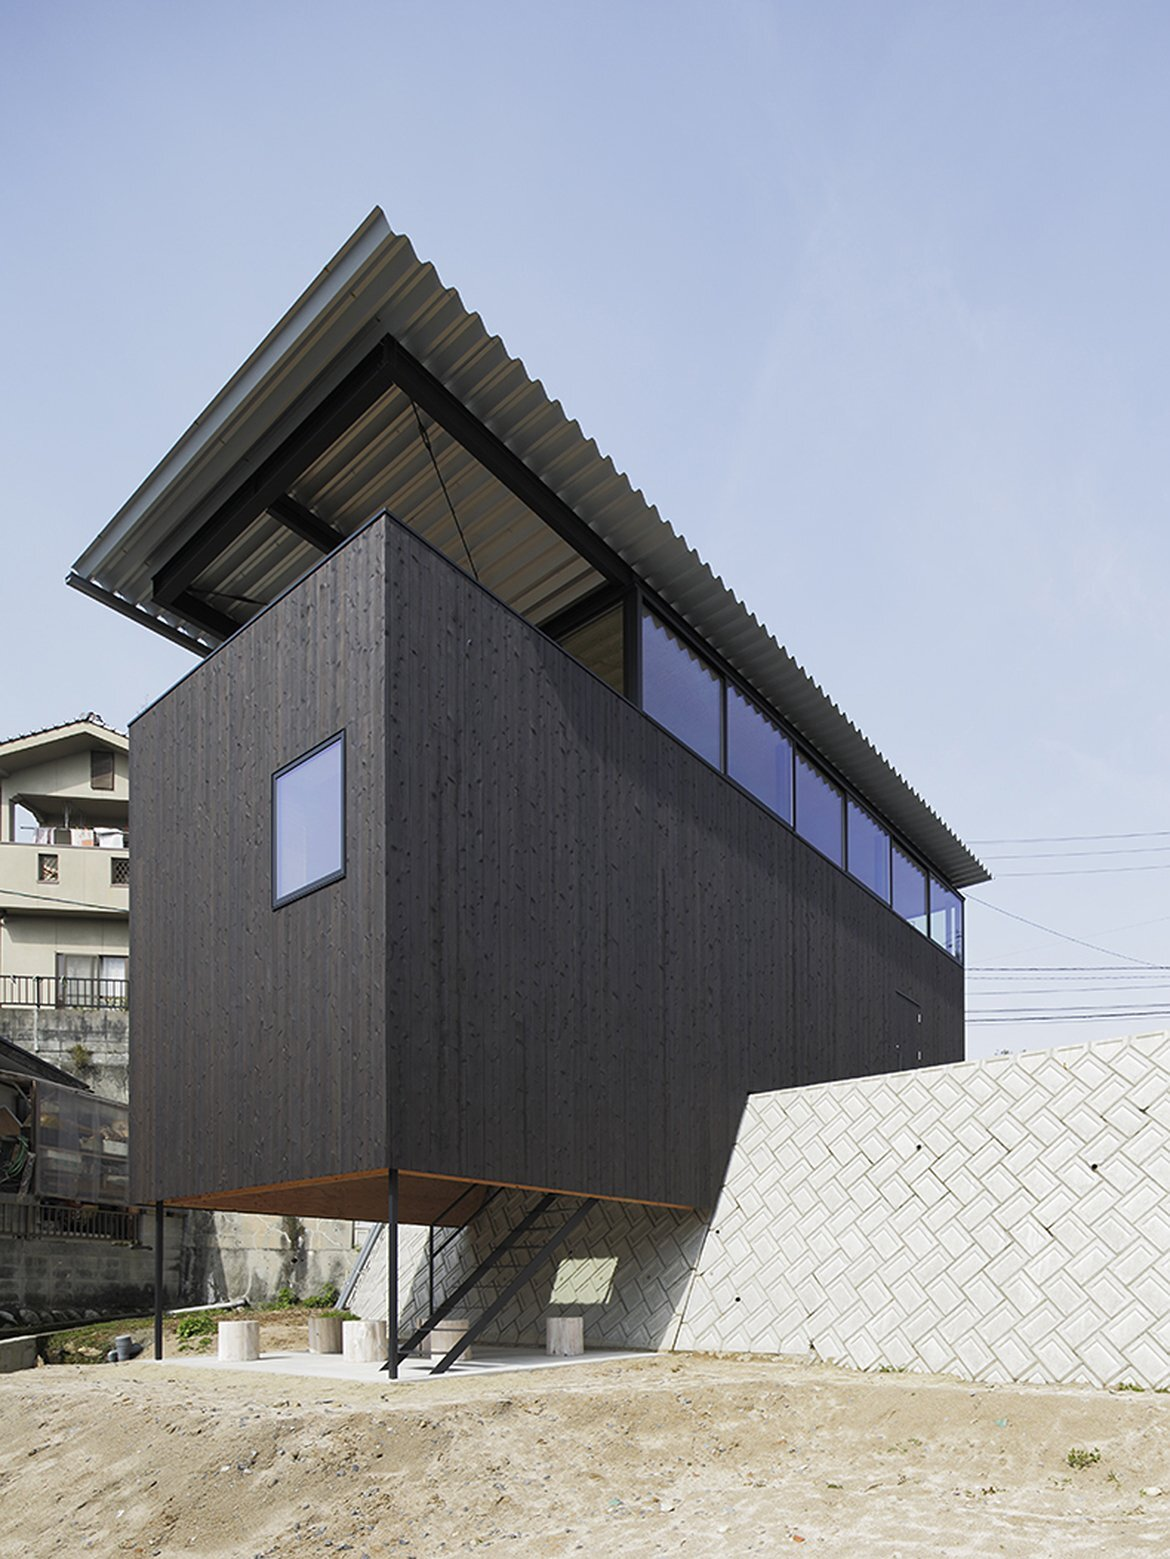 House in Miyake - Japanese House - Hidetaka Nakahara Architects - Yoshio Ohno Architects - Hiroshima Japan - Exterior - Humble Homes